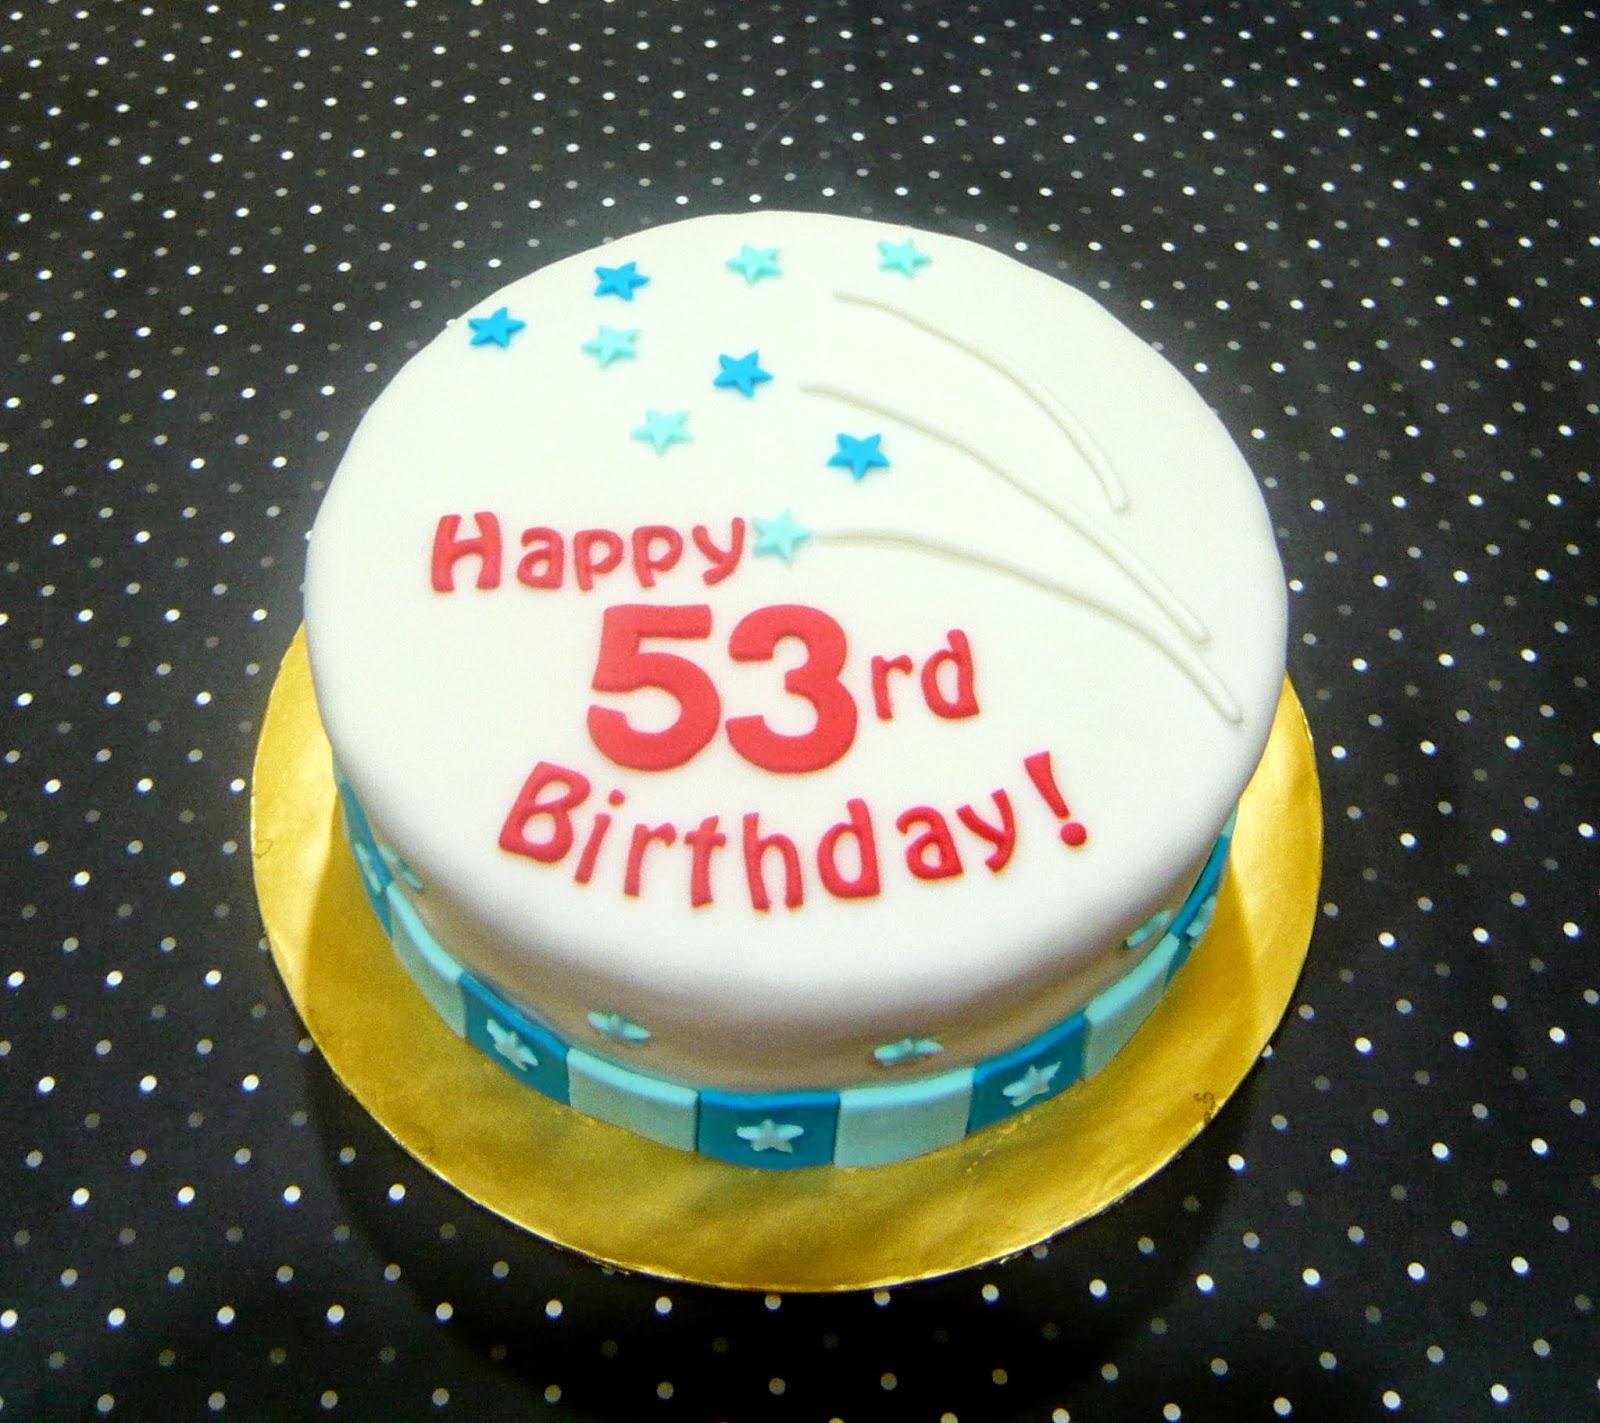 Happy Rd Birthday Cake